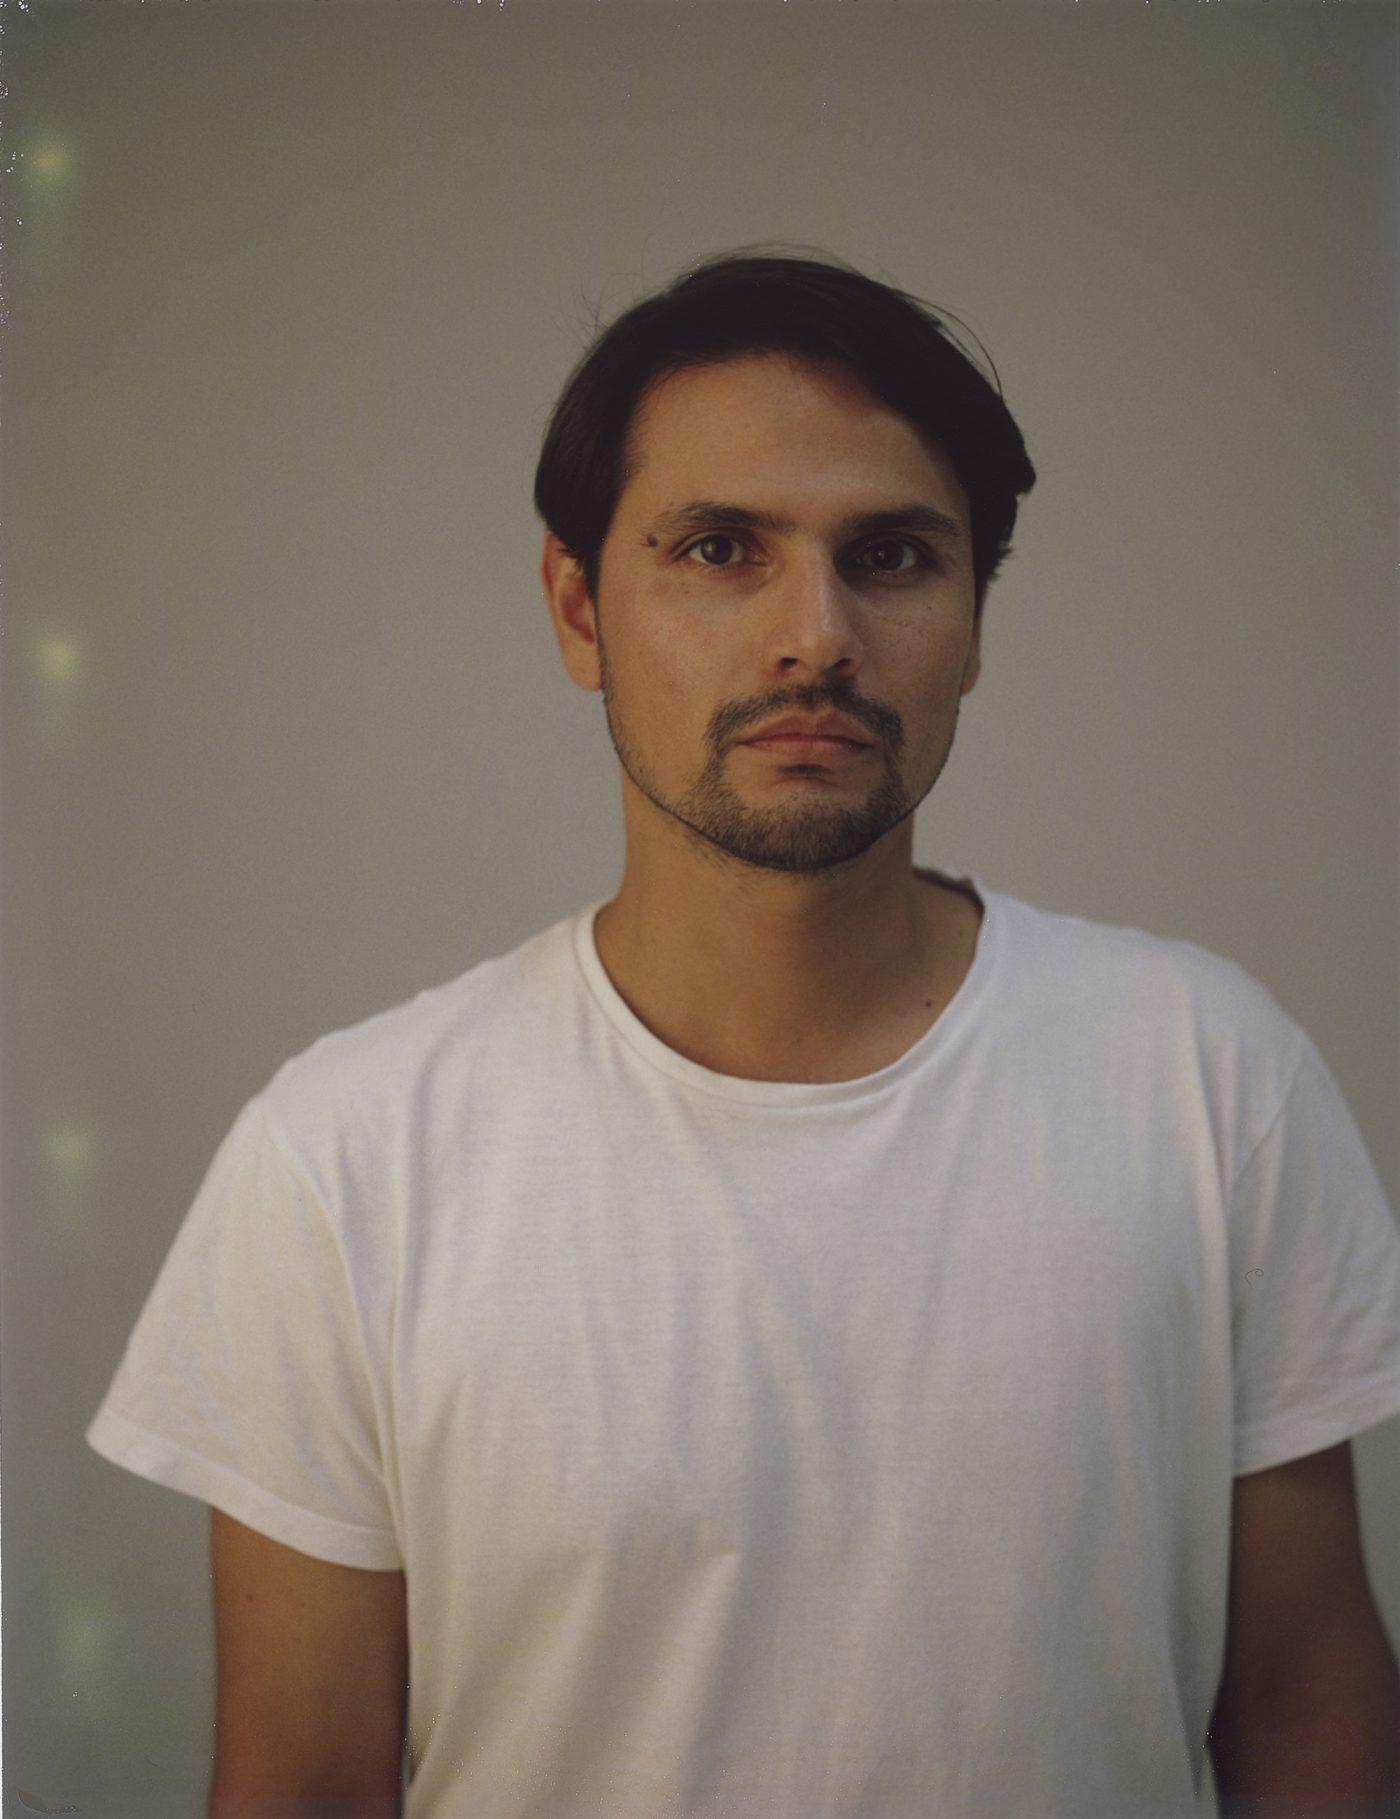 Lucas Gutierrez